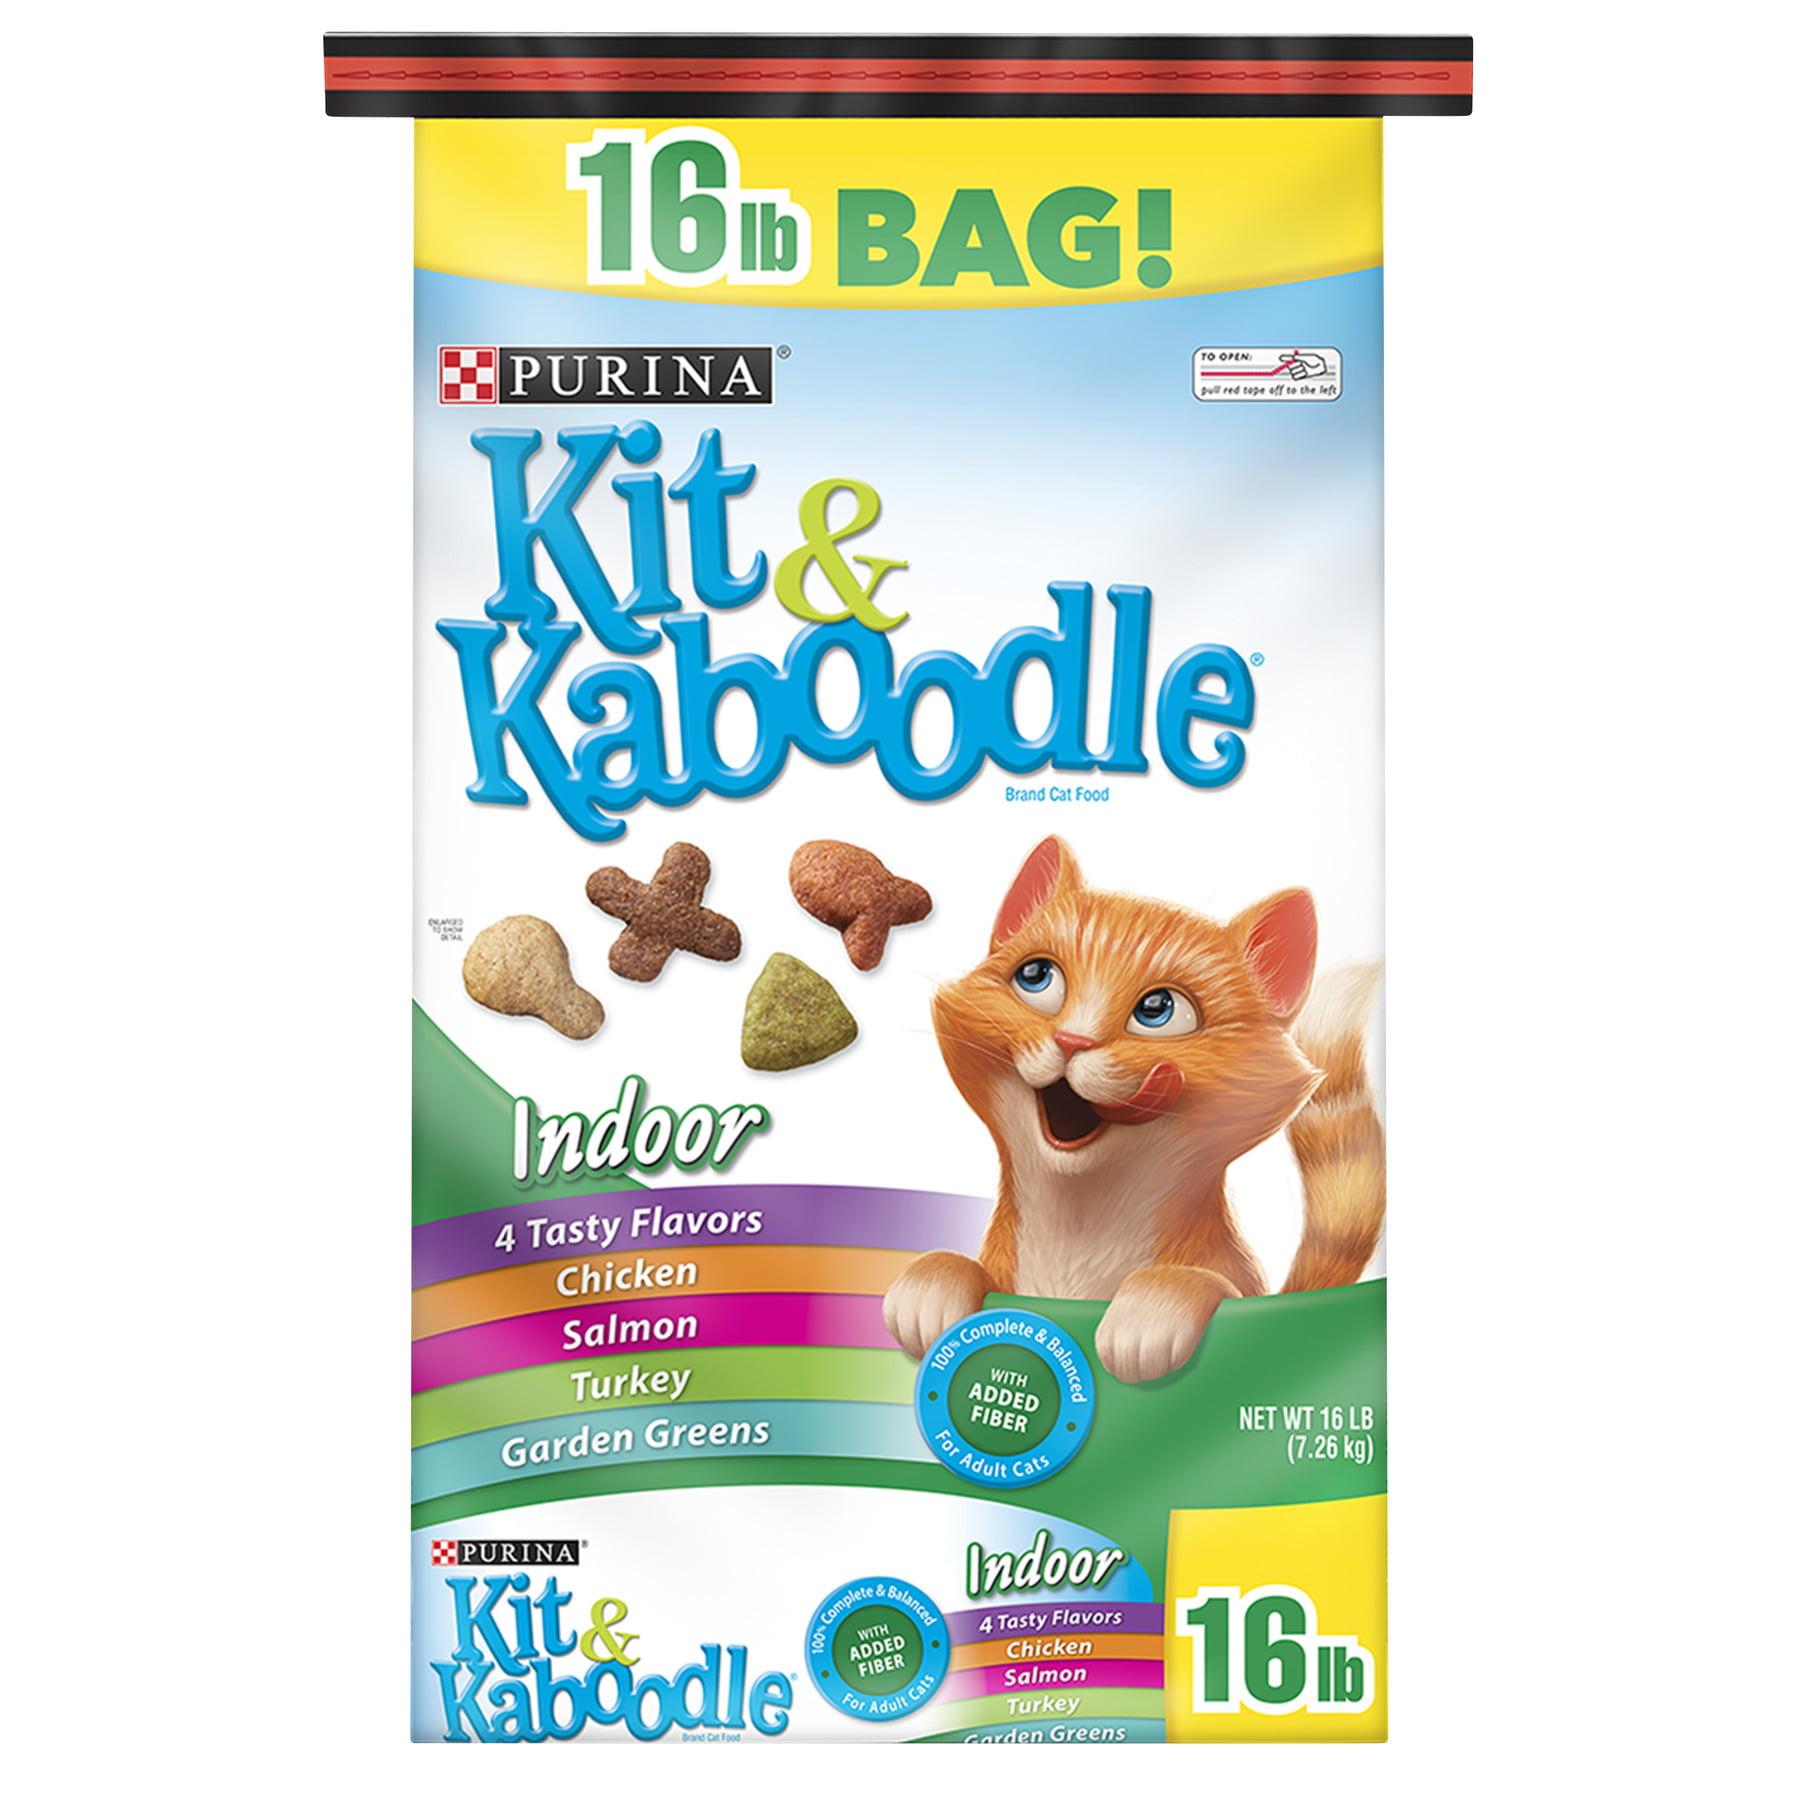 Purina Kit & Kaboodle Indoor Adult Dry Cat Food - 16 lb. Bag, 16.0 LB